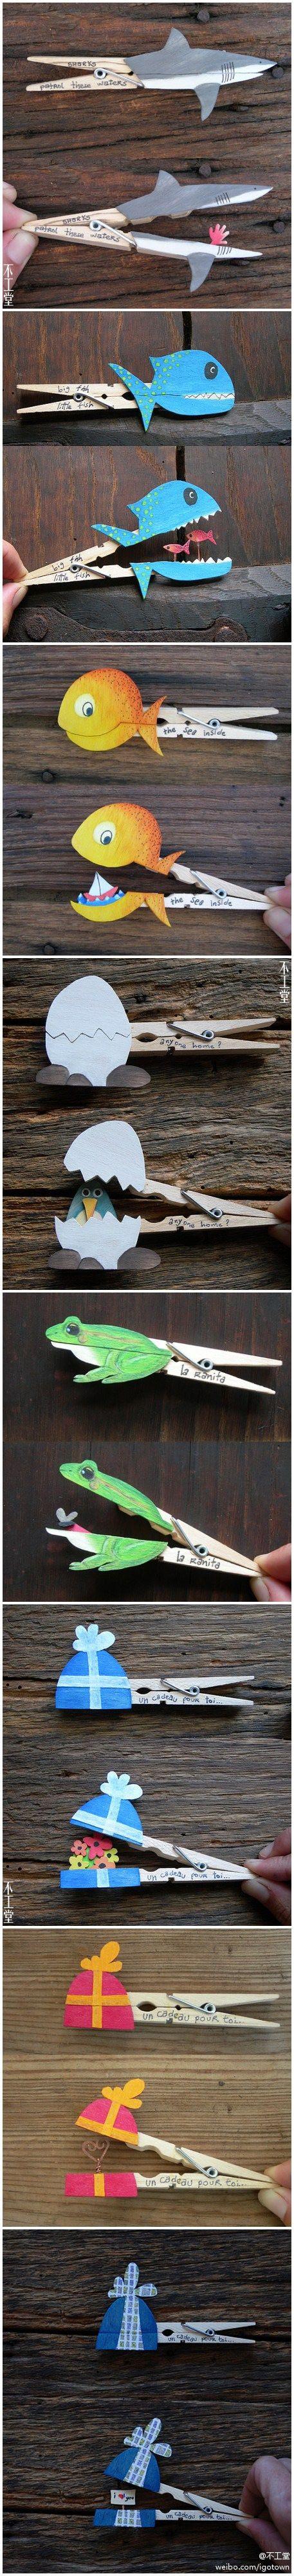 clothespin animals - #kids #craft #summer #diy